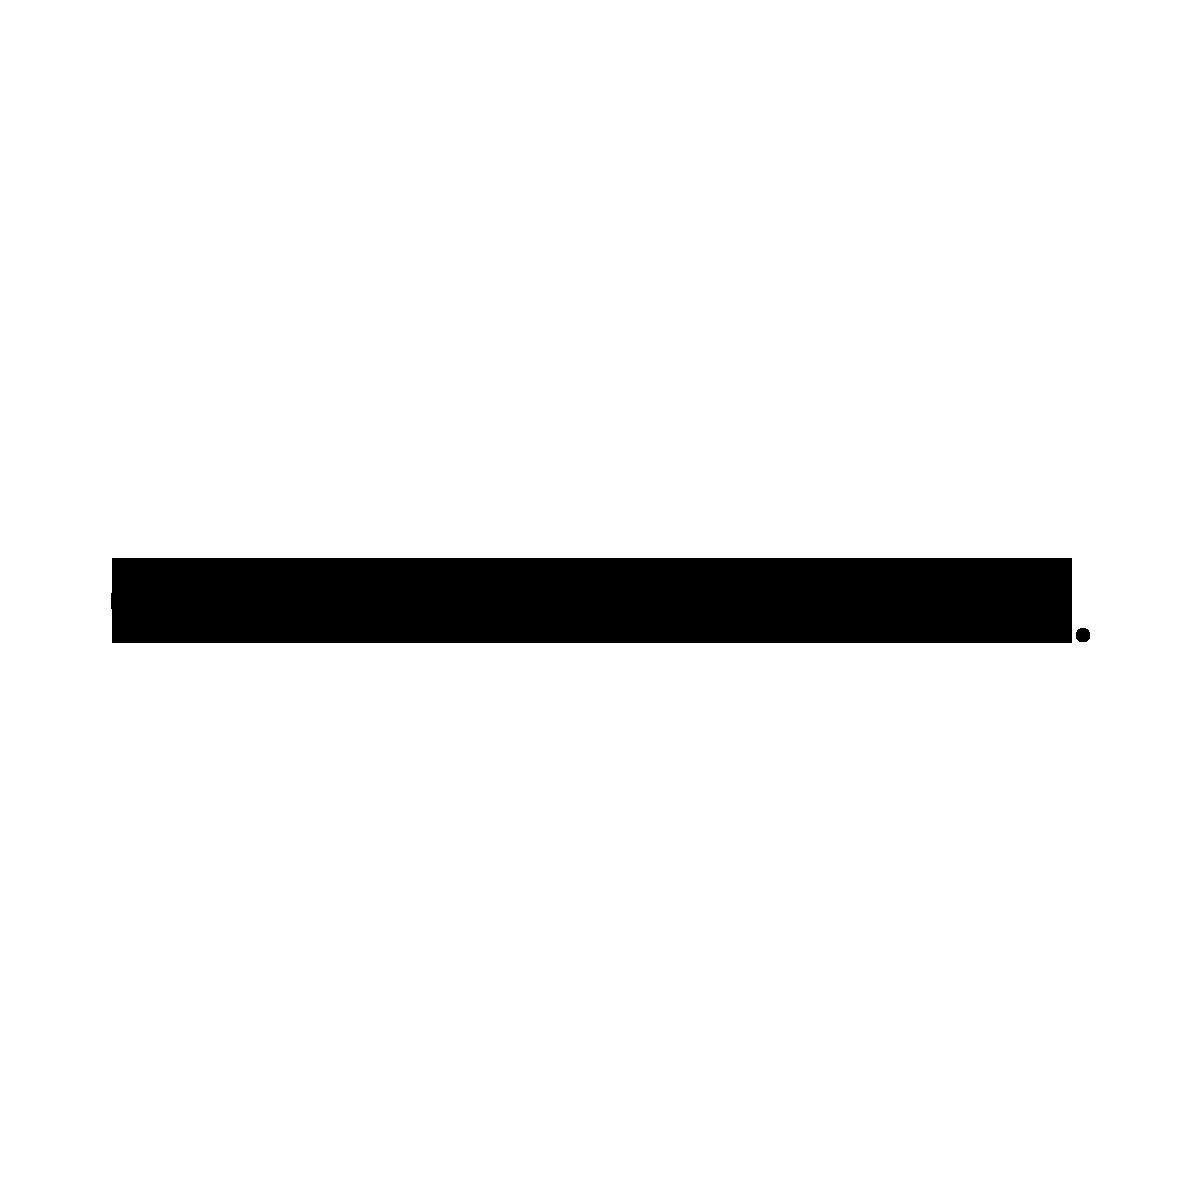 Sneaker-soft-nappa-leather-white